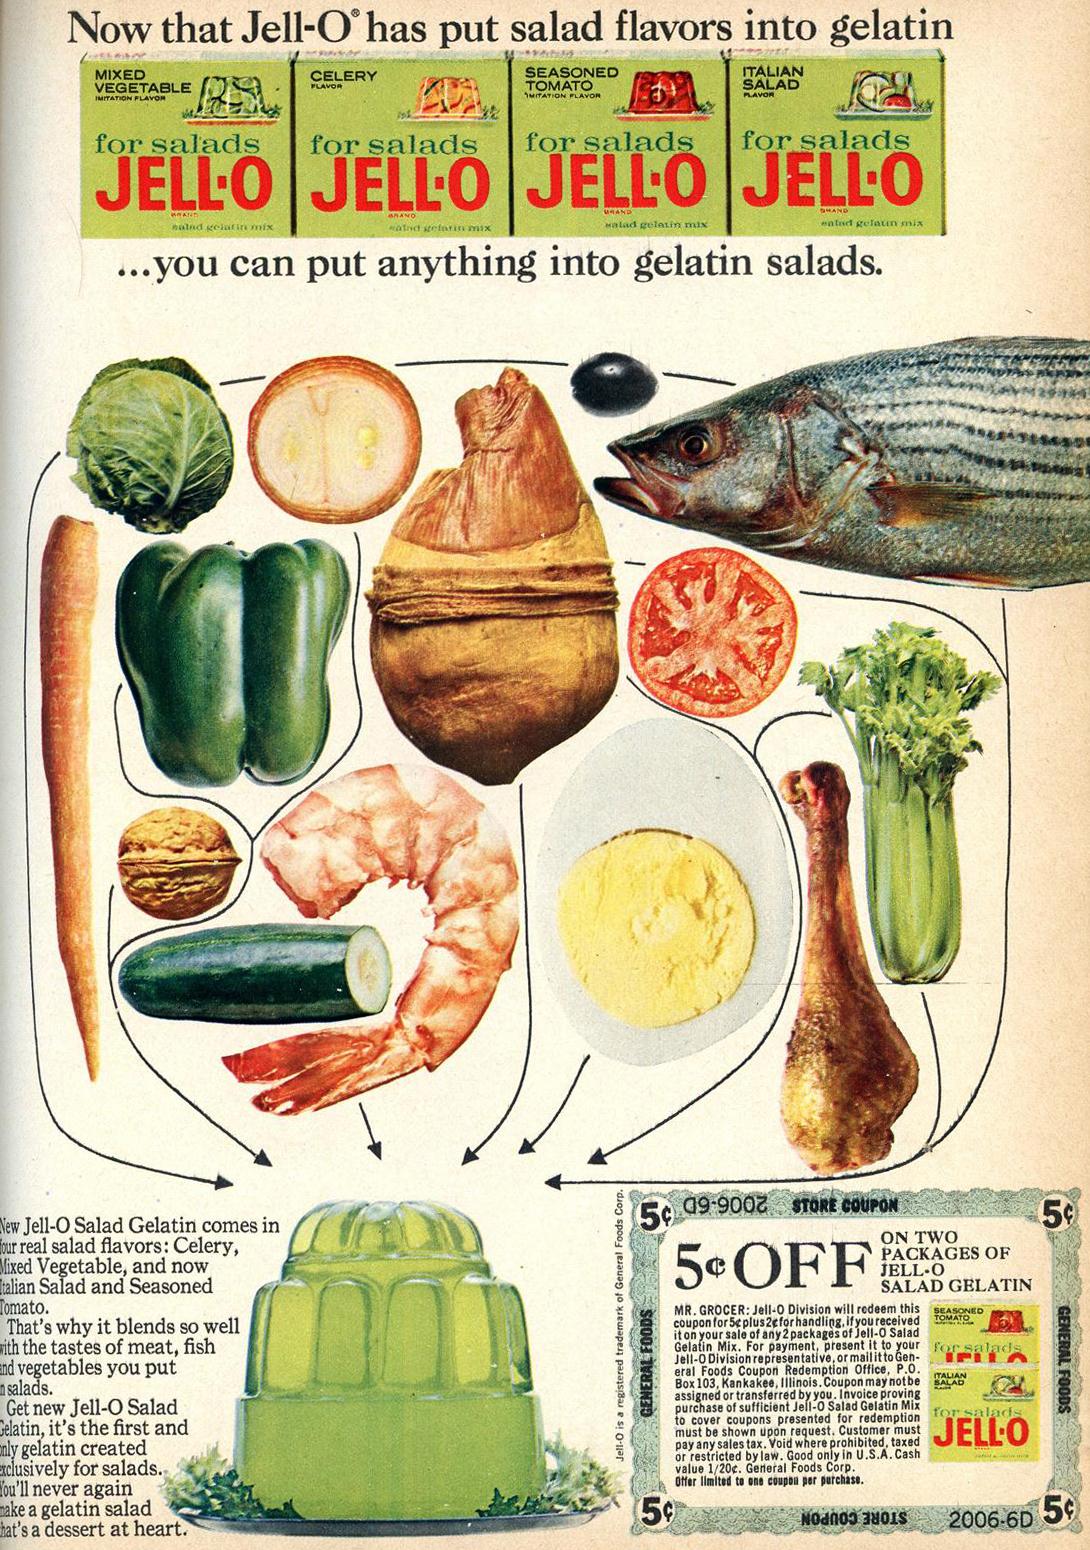 Salad-Flavored-Jello-Ad001.jpg